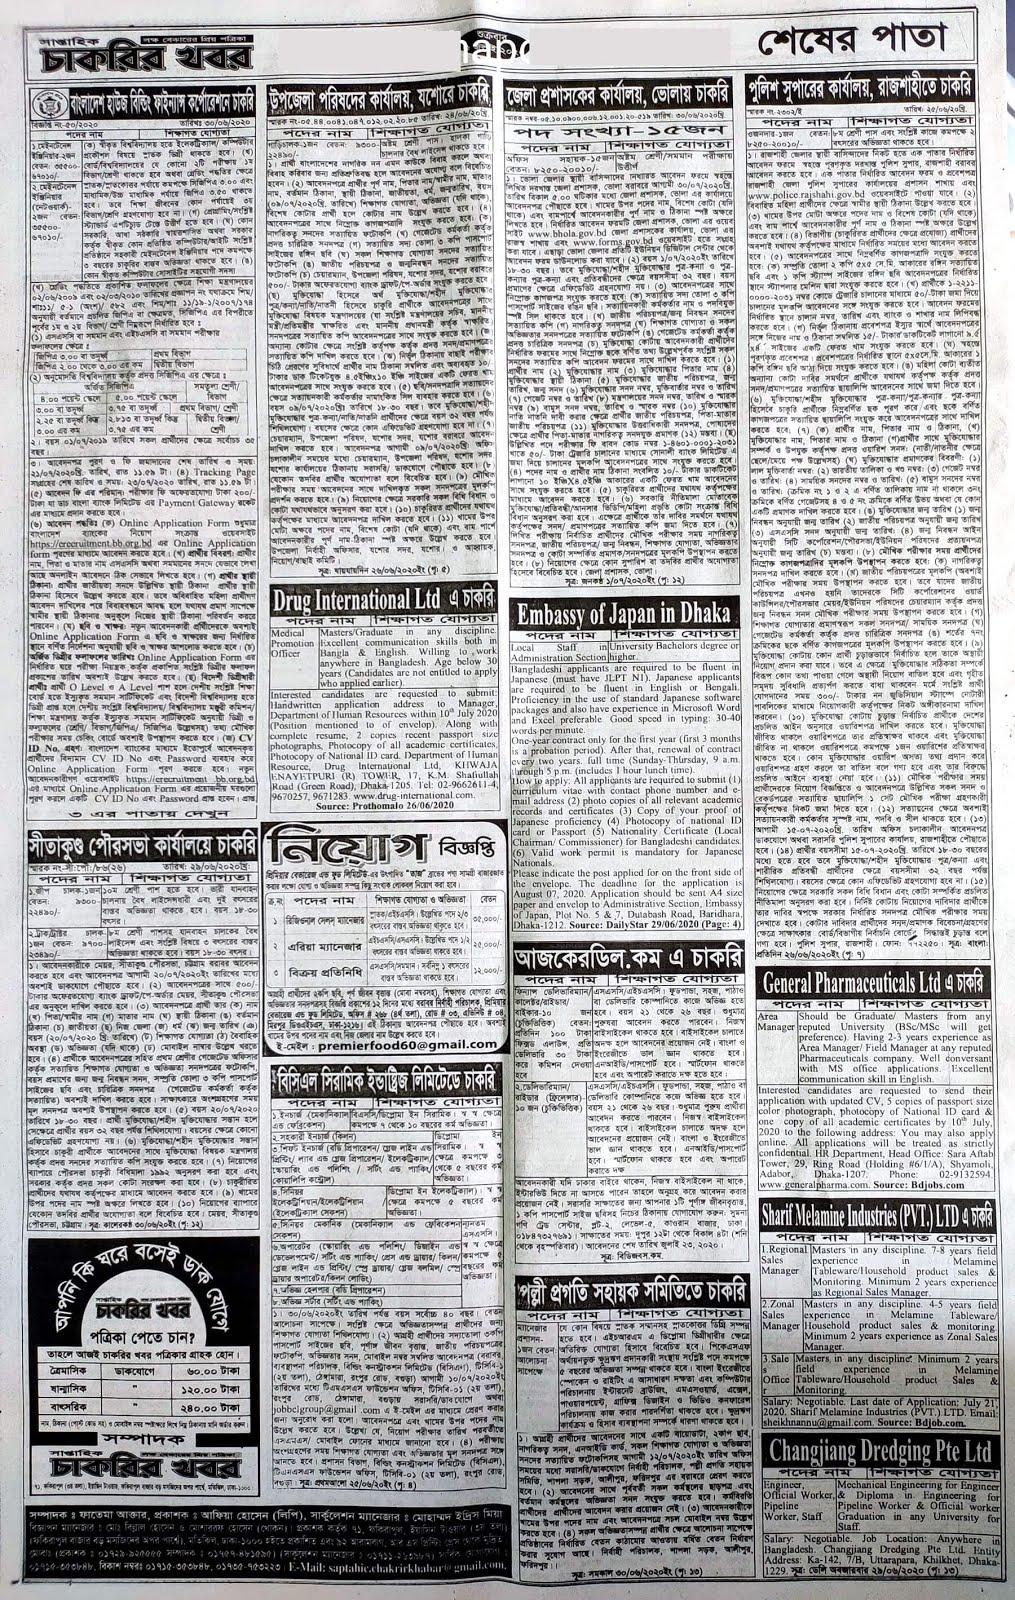 Weekly Job Newspaper Chakrir Khobor Potrika